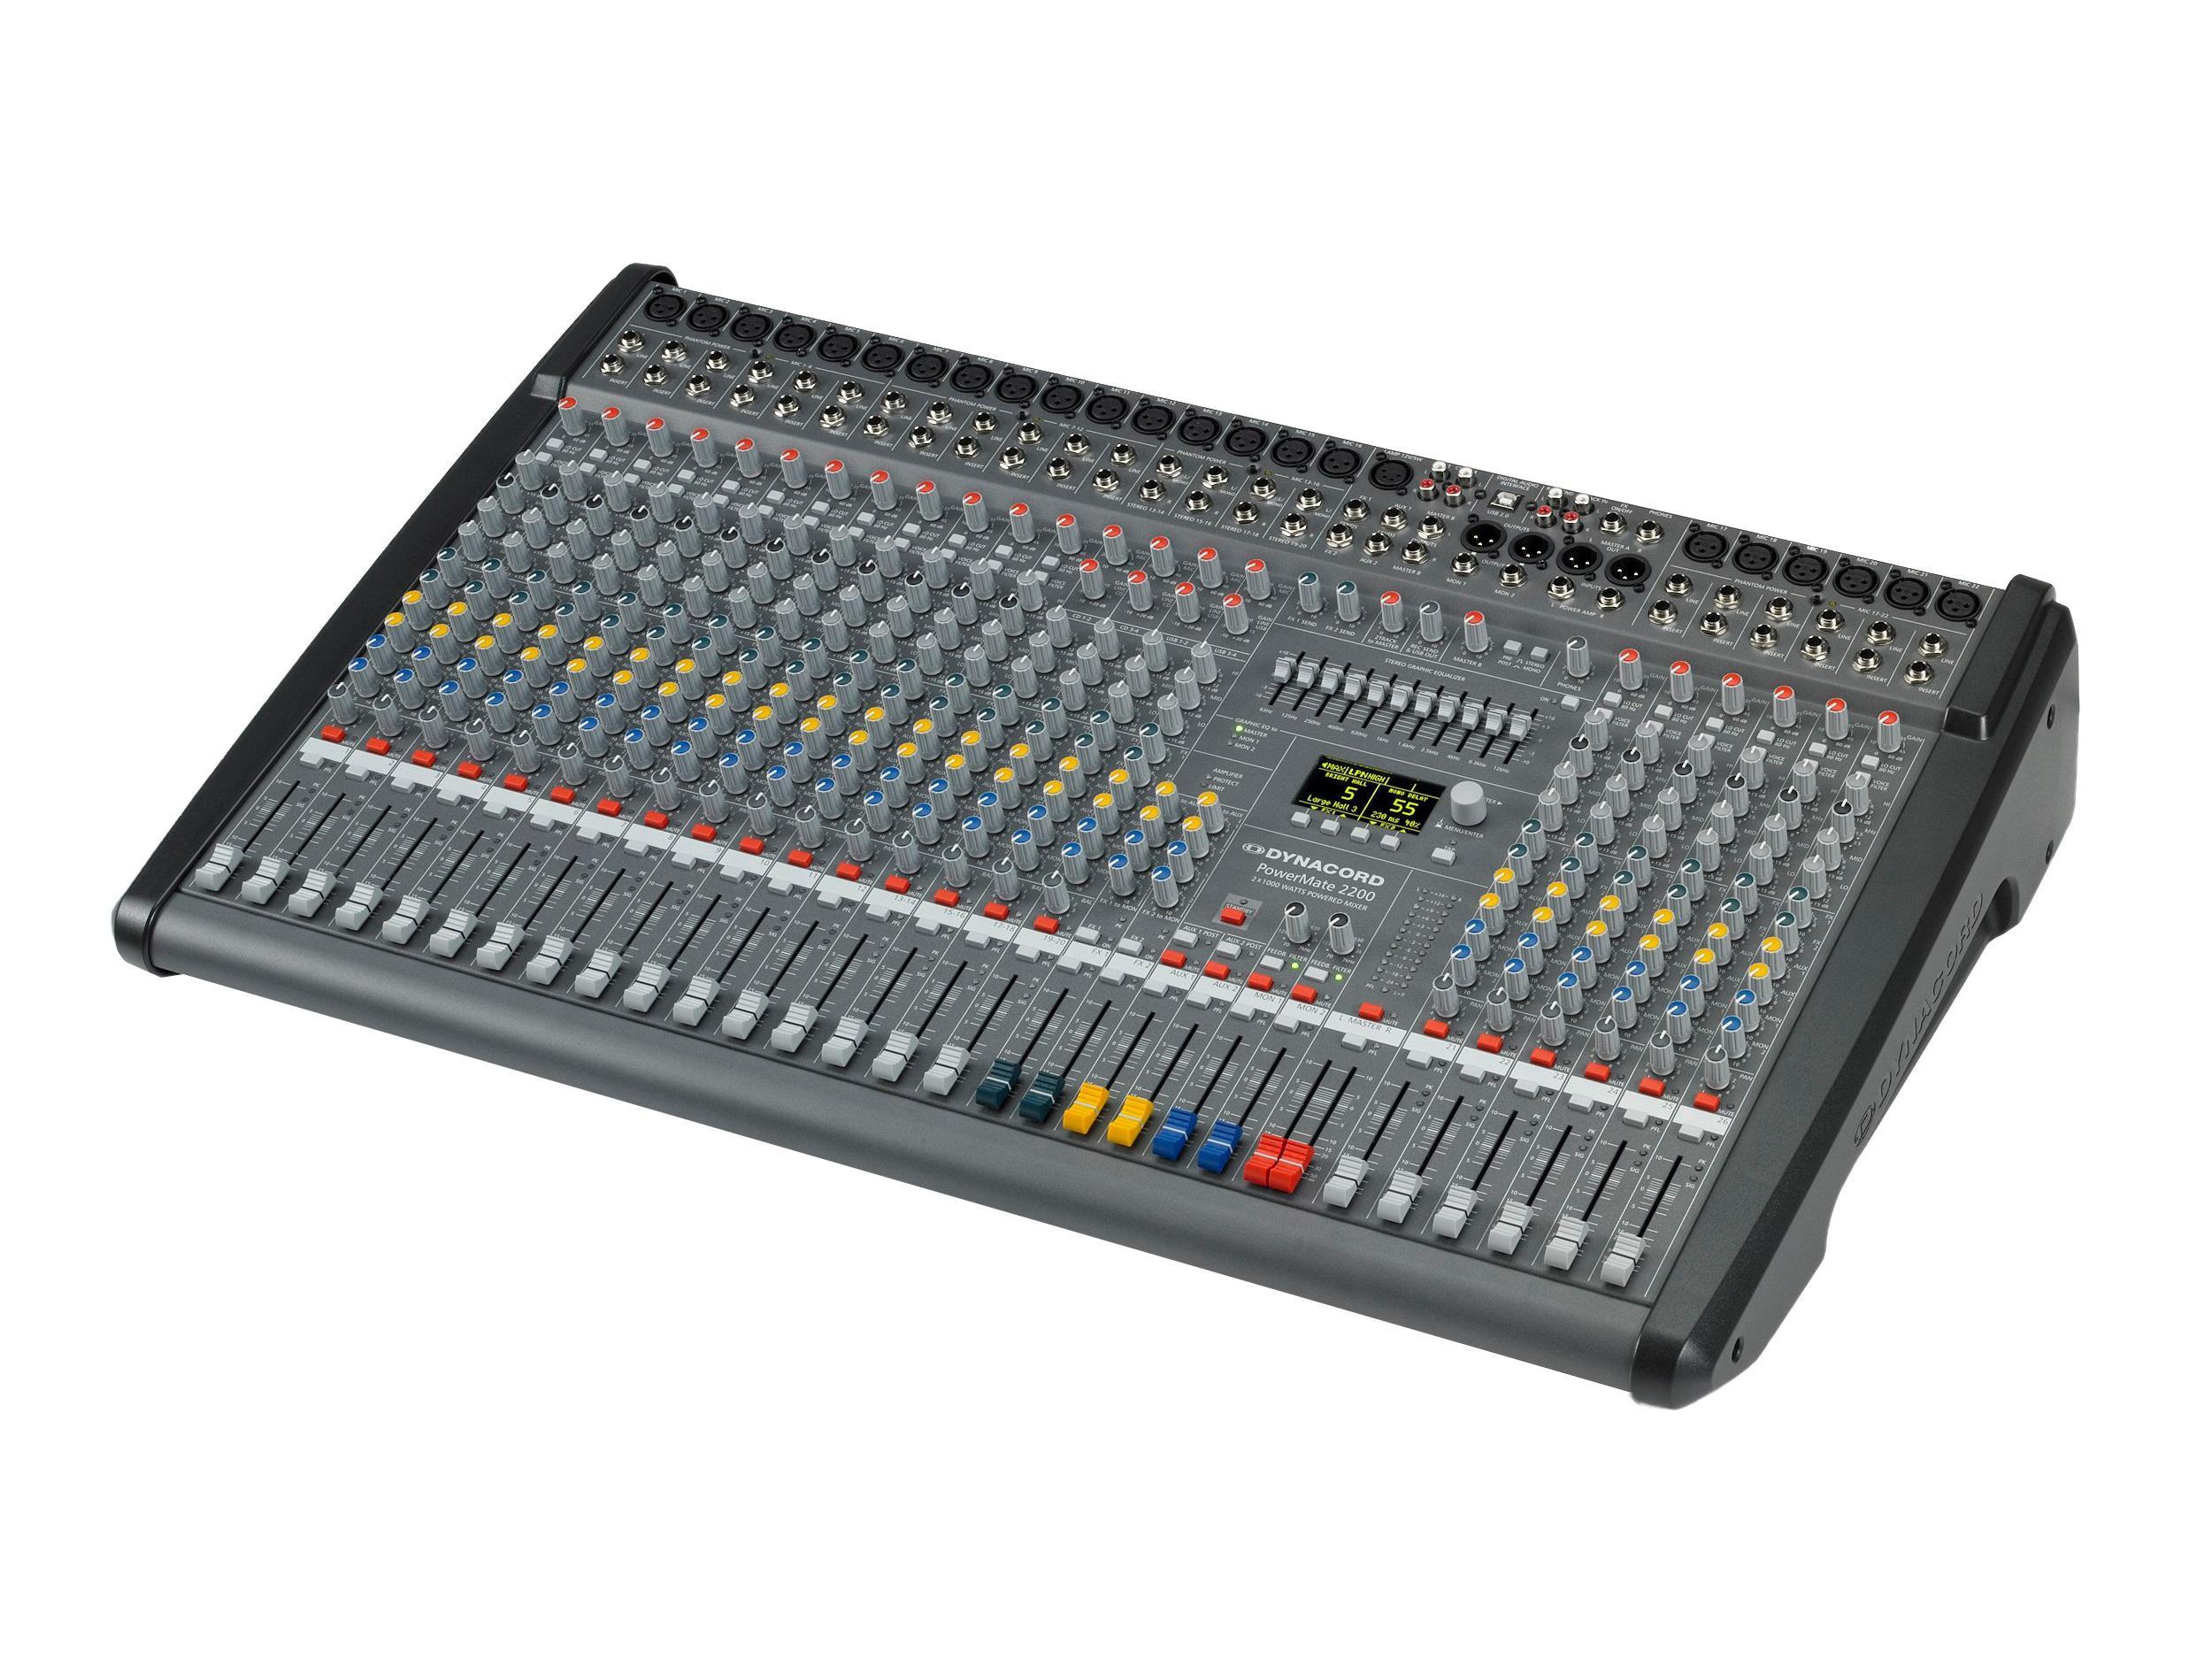 Dynacord DCPM22003UNIV Power Mixer/18 Mic/Line w 4 Mic/Stereo Line Channels/6xAUX/Dual 24 bit Stereo Effects/USB Audio Interface/Power Amp 2x1000W